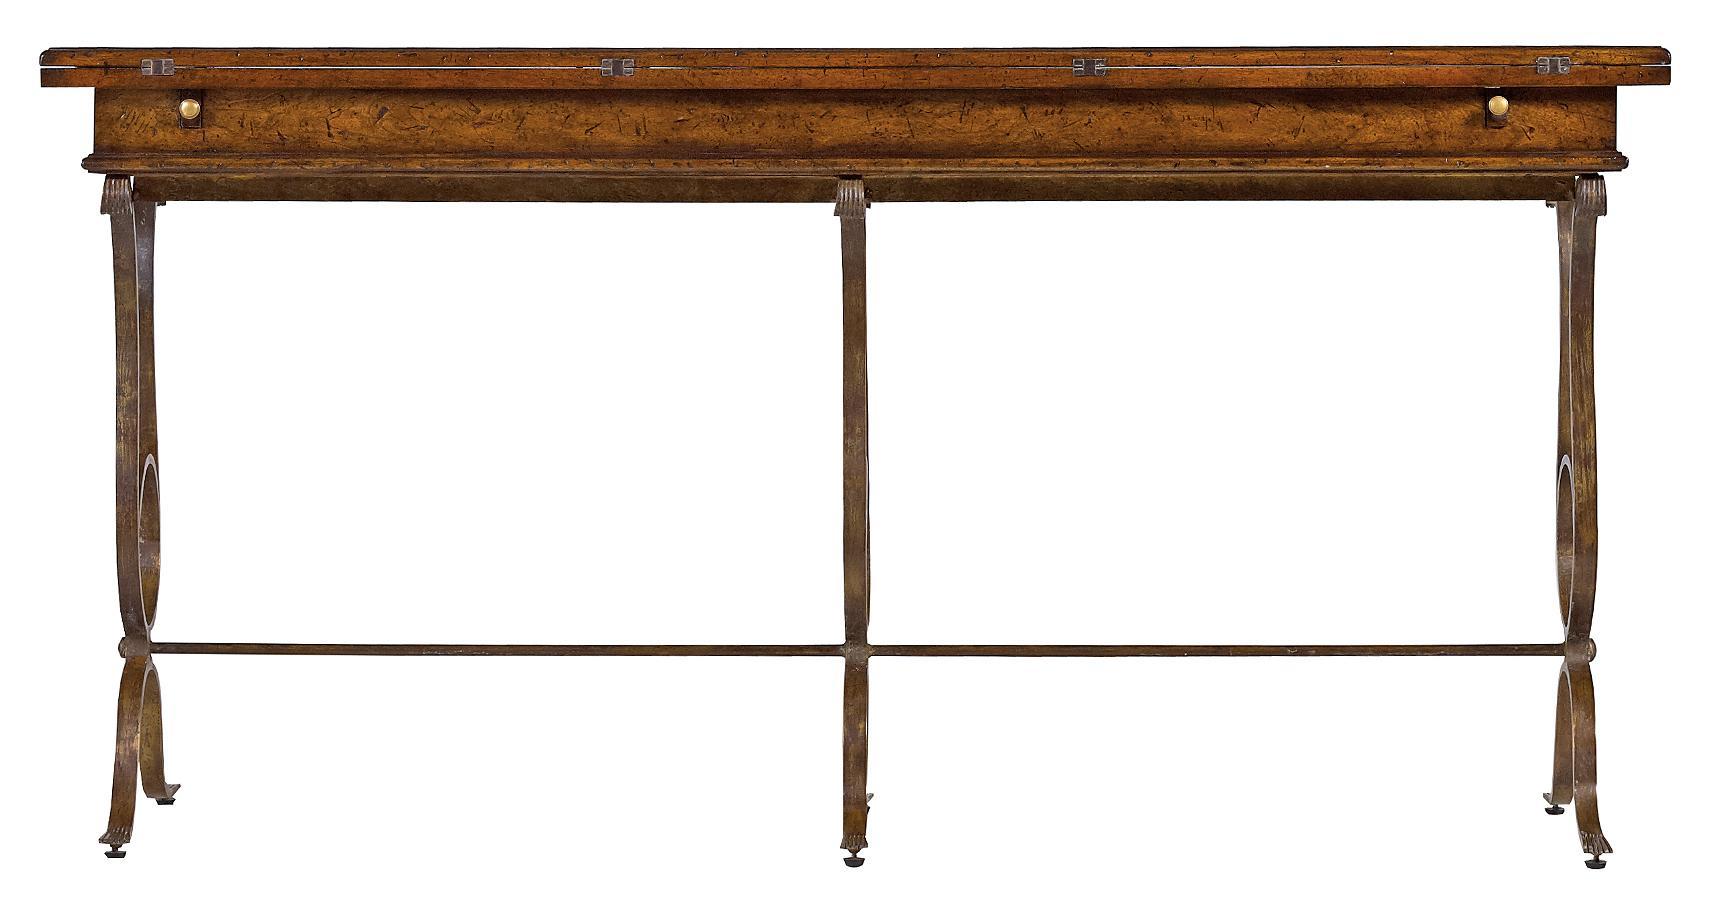 Stanley Furniture Arrondissement Villette Flip Top - Item Number: 222-15-06